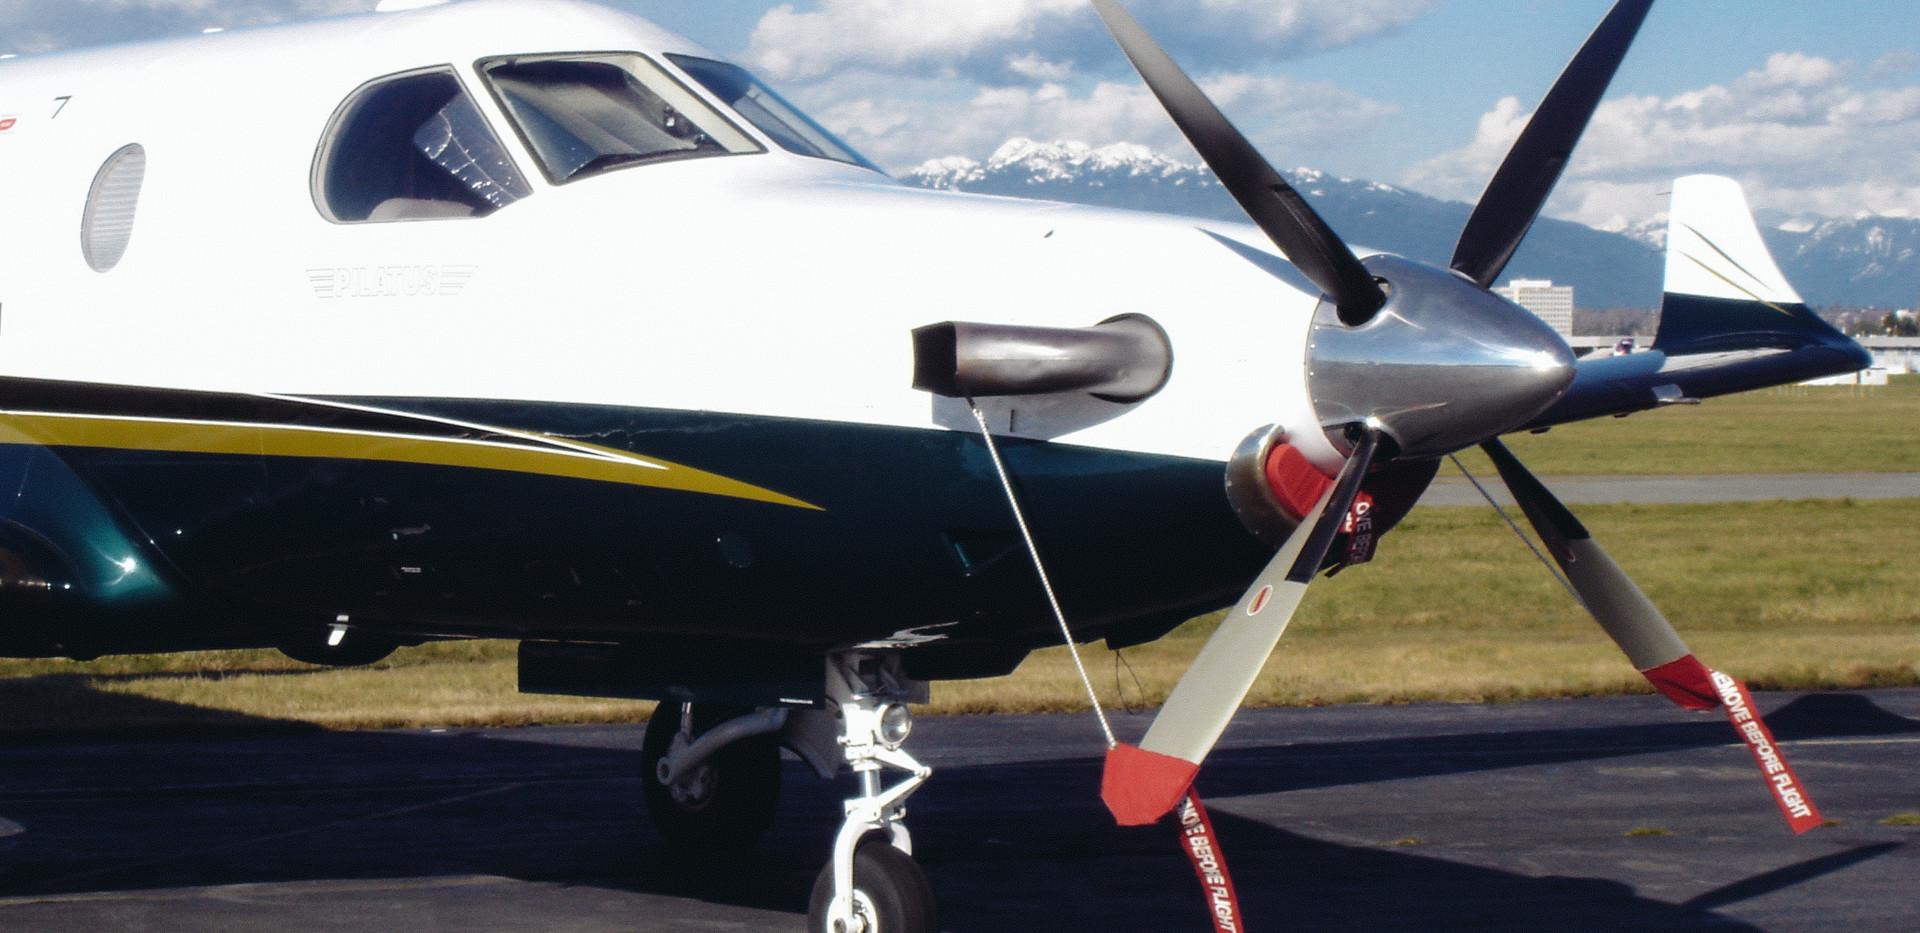 Western Propeller Capabilities Pilatus PC-12 Hartzell